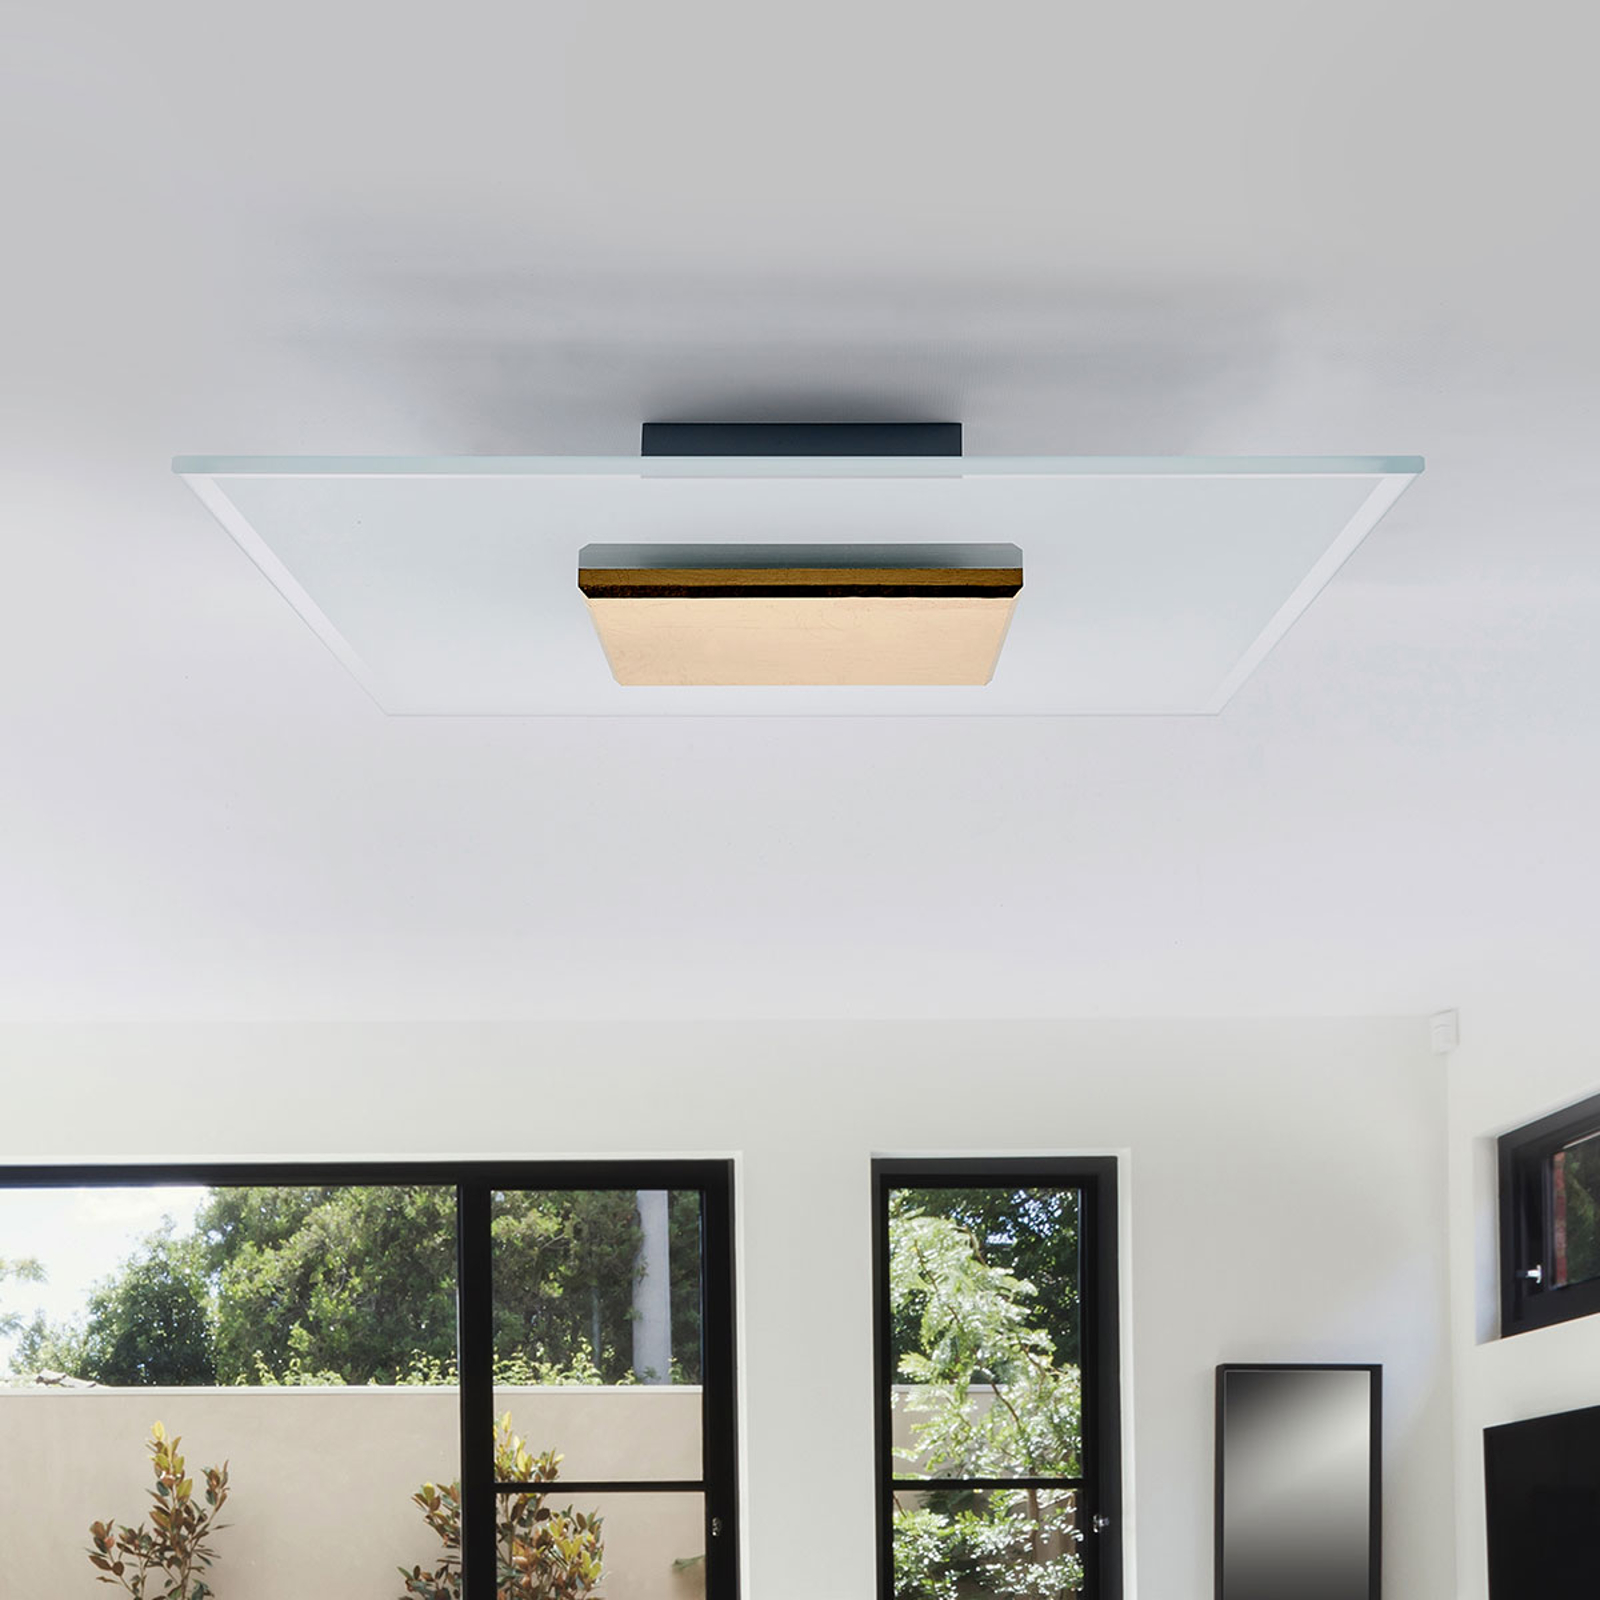 LED-plafondlamp Lole goud 38 cm